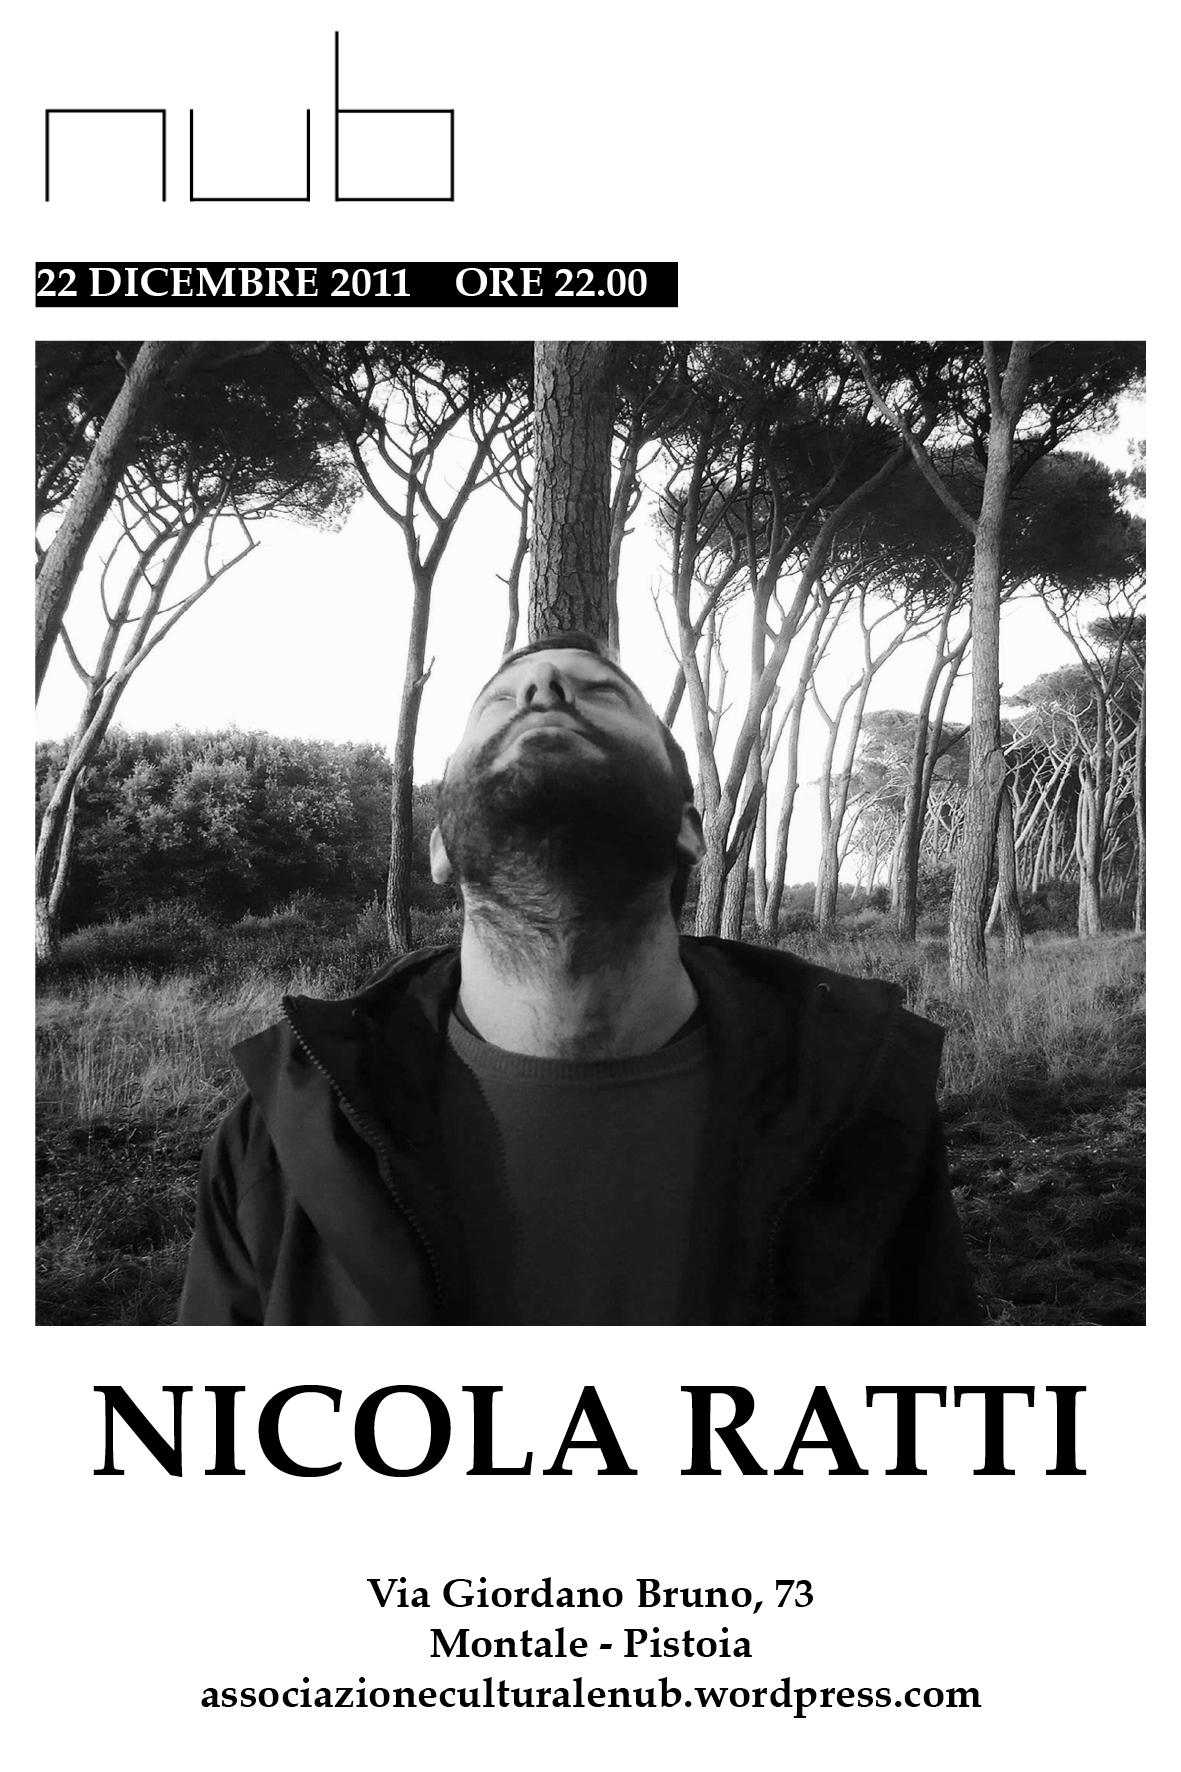 NICOLA RATTI | 22.12.2011